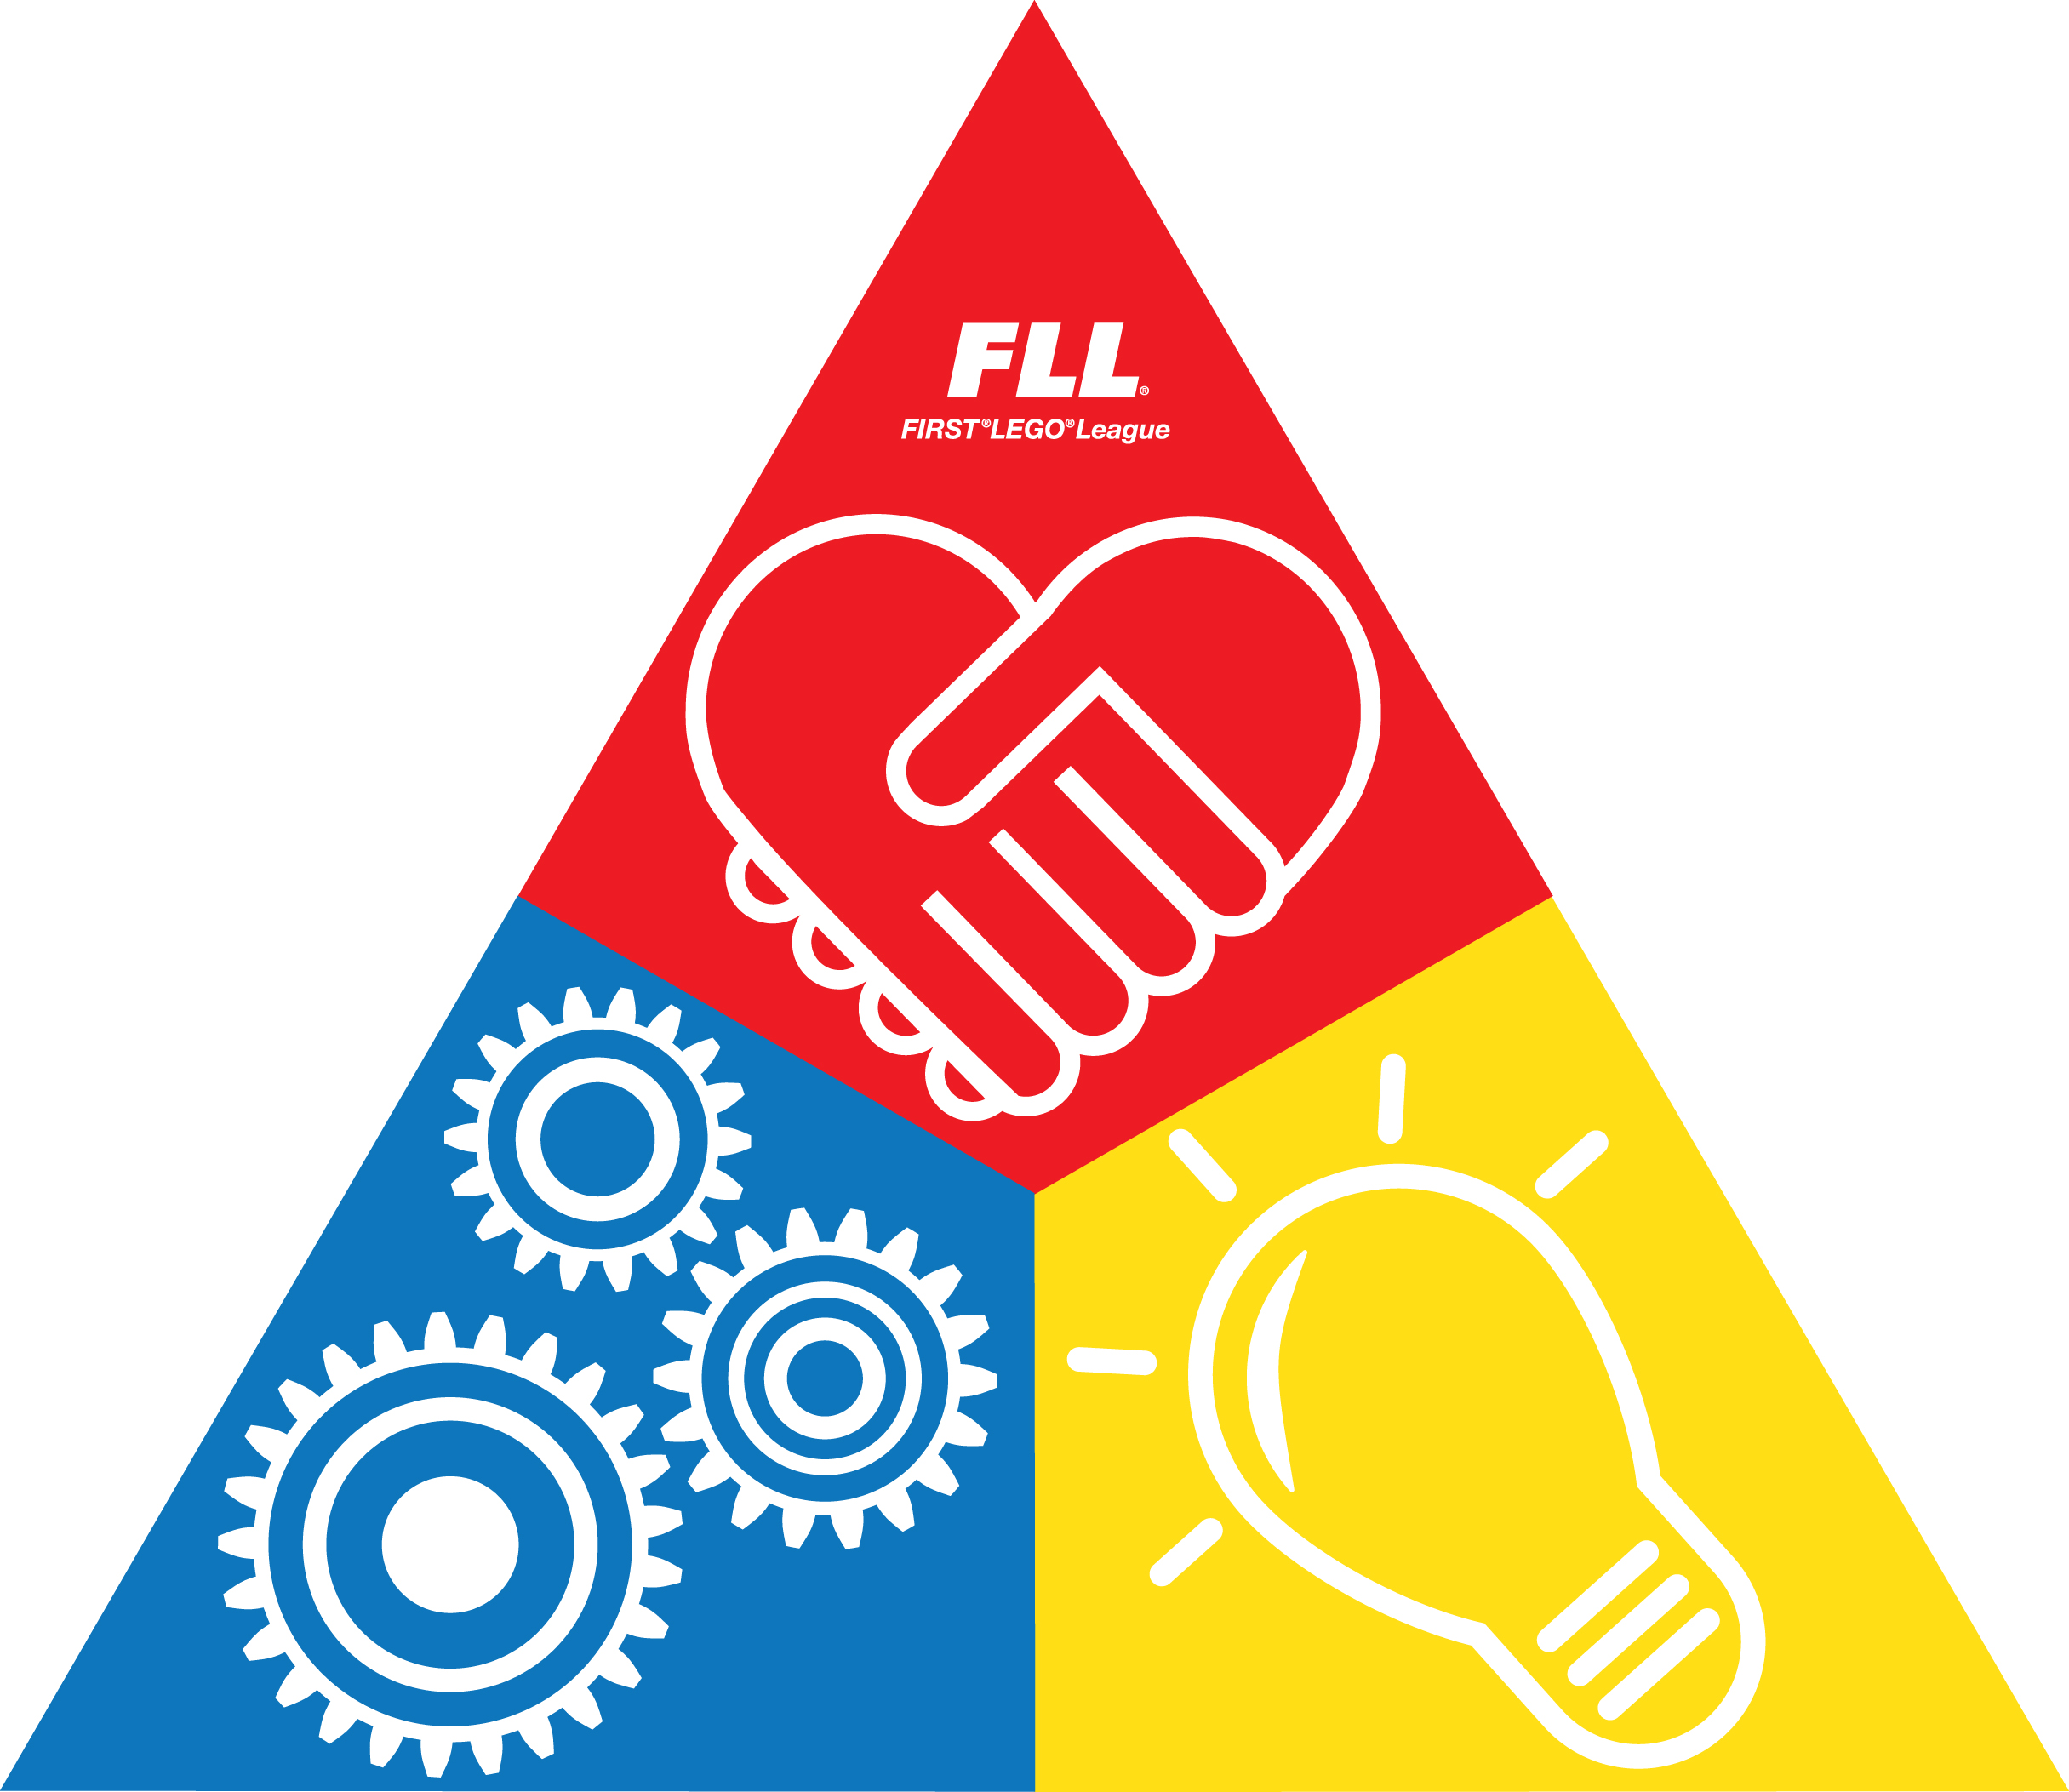 FLL full triangle.jpg